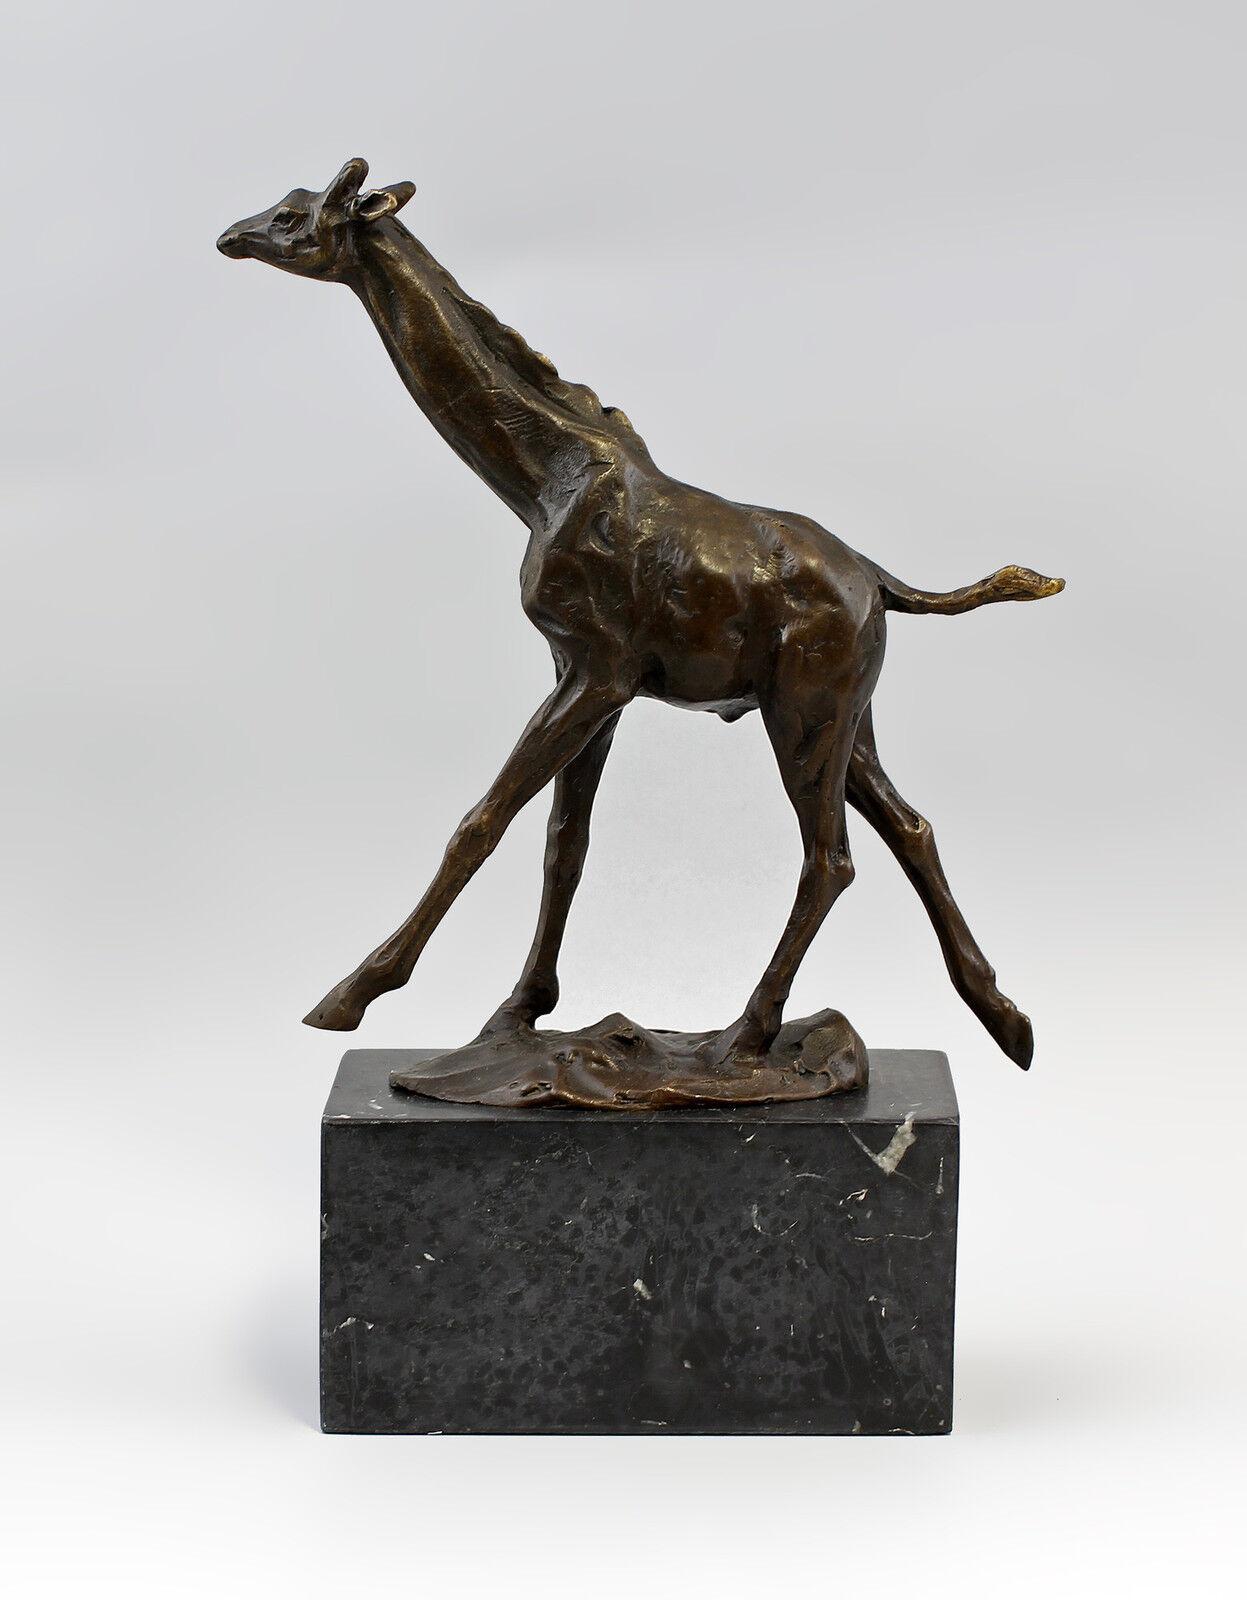 Skulptur Bronze Plastik Figur Giraffe 9937832